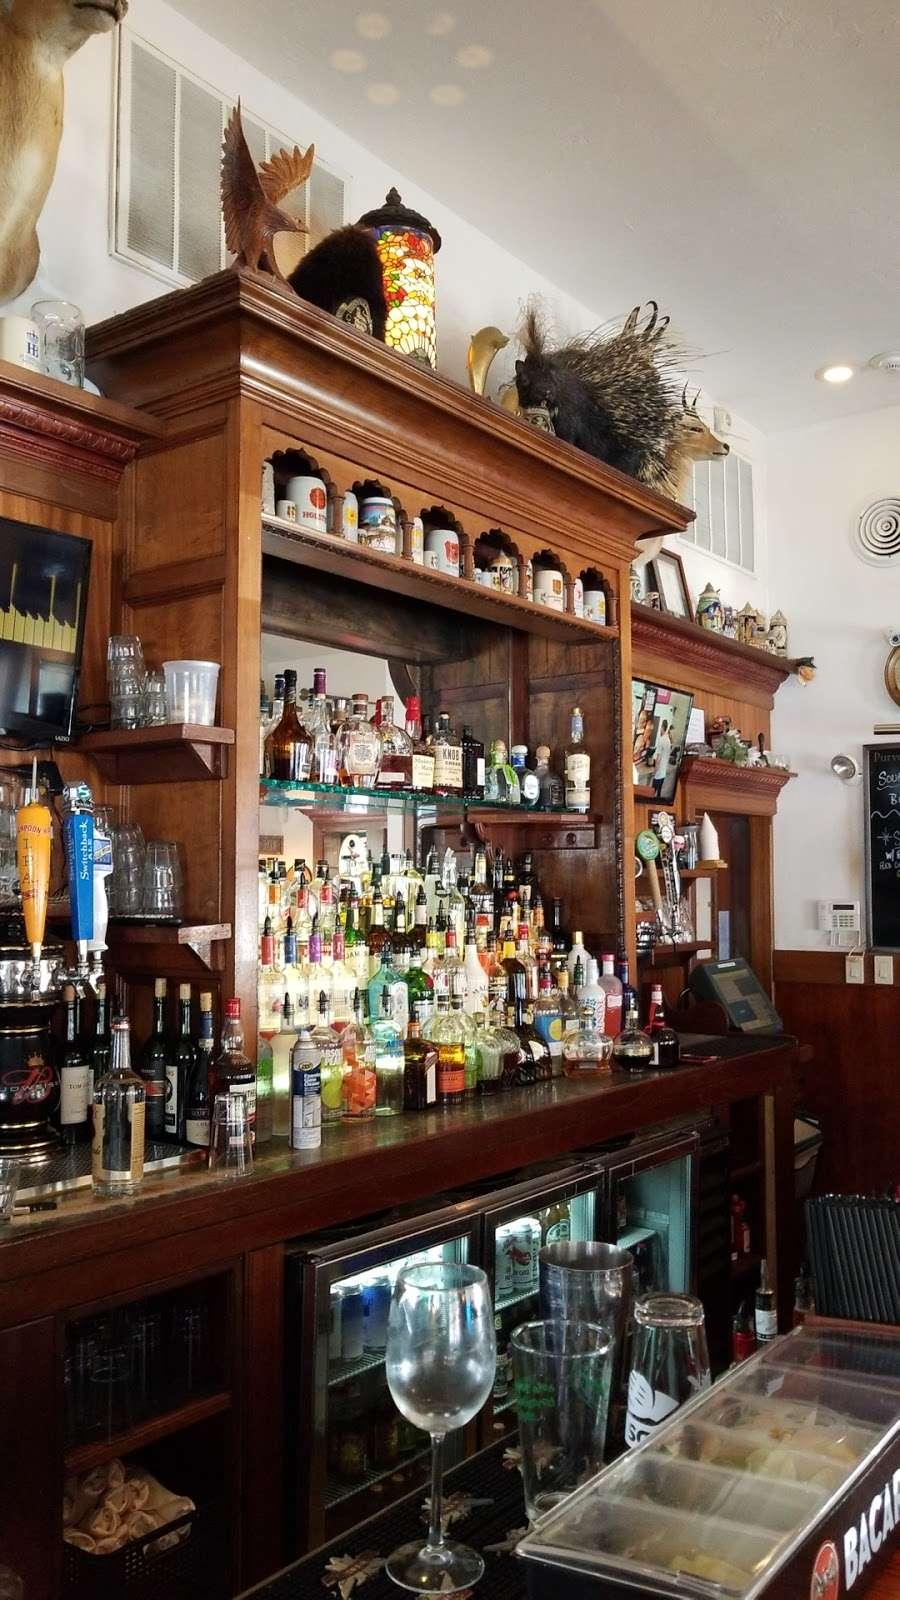 The Village Tavern - restaurant  | Photo 1 of 10 | Address: 90 Hartford Pike, North Scituate, RI 02857, USA | Phone: (401) 764-0893